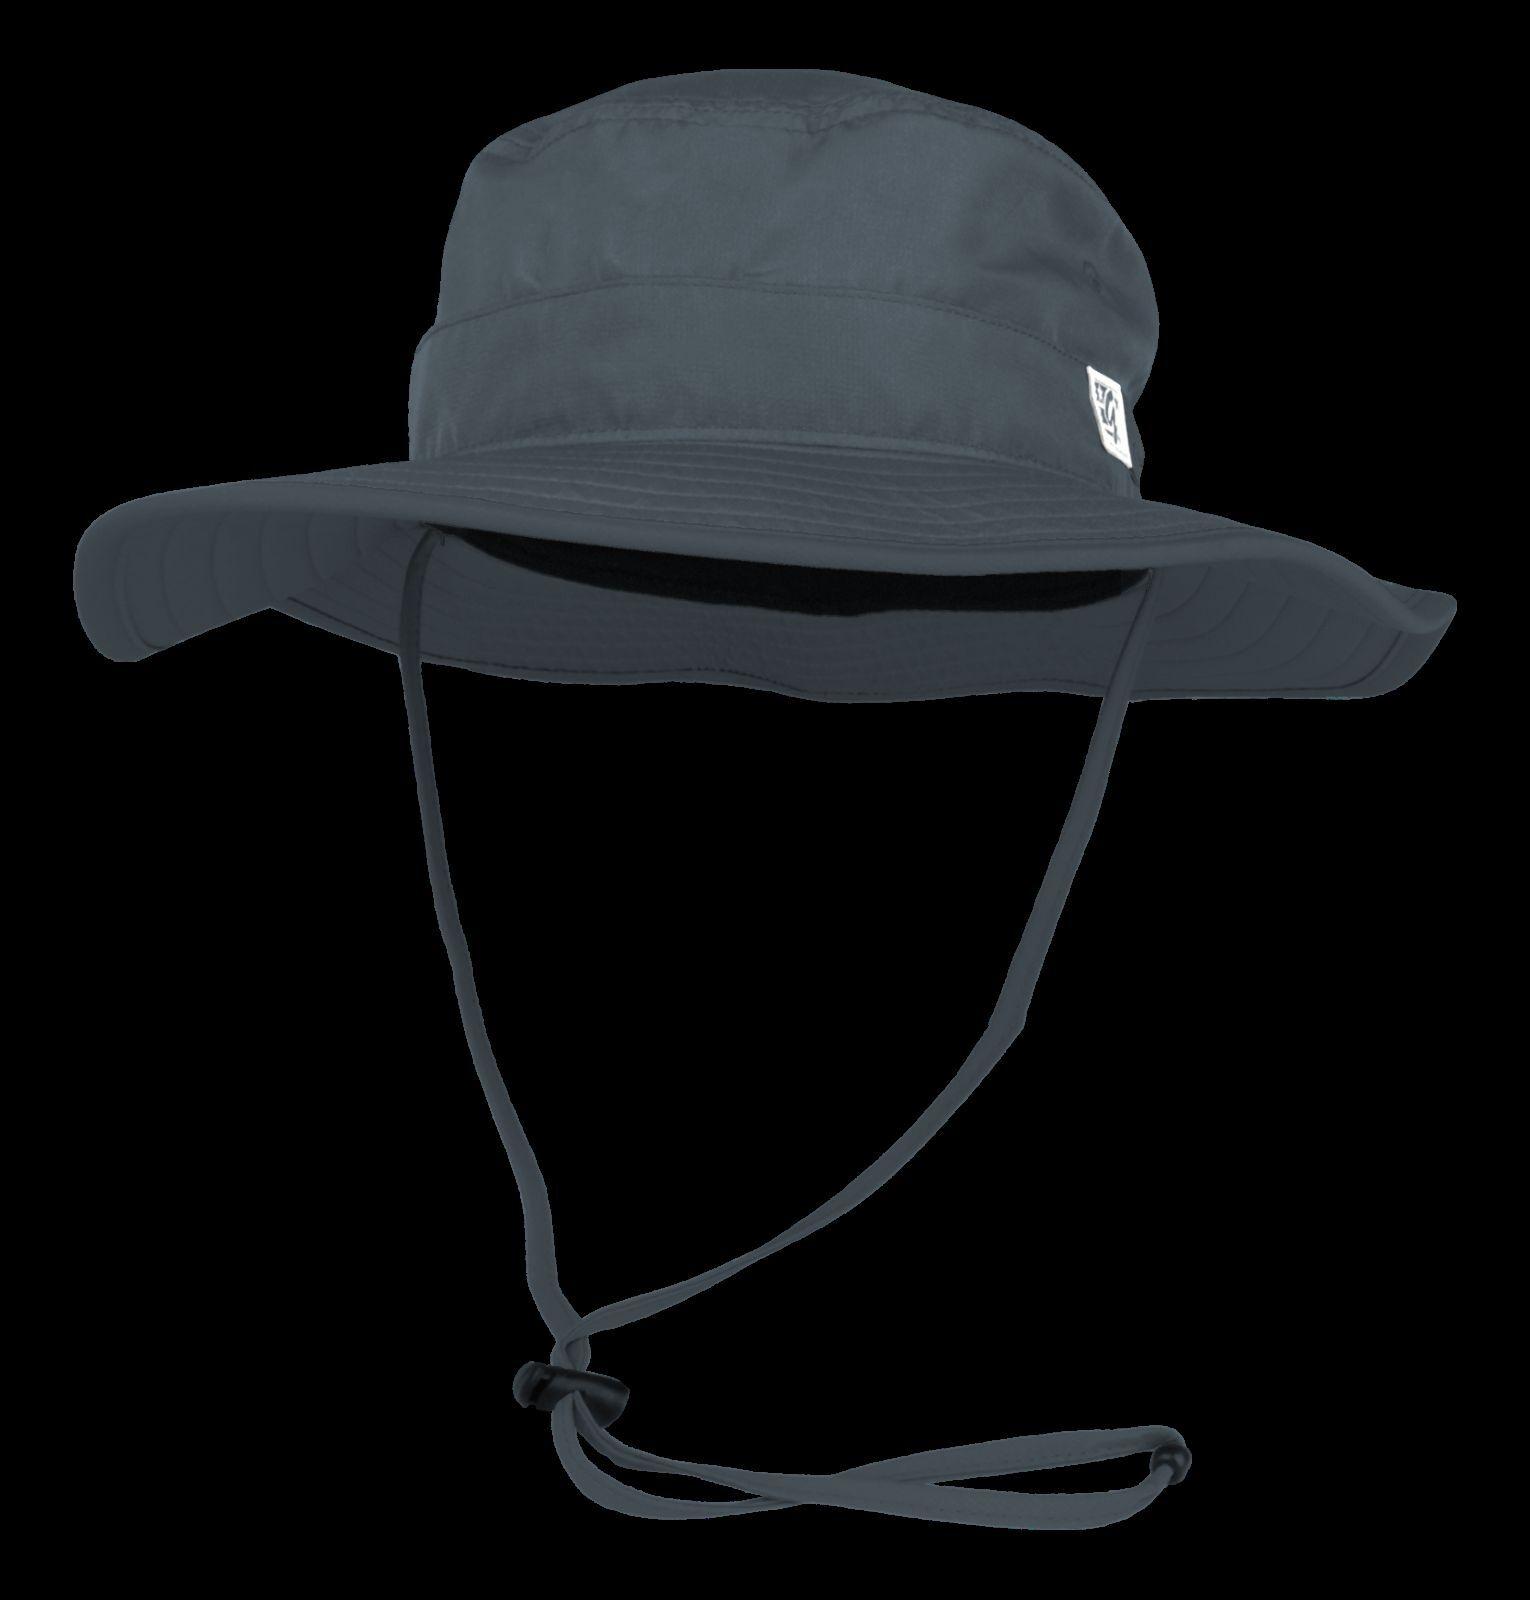 bd5ac43ef71 The Game Athletic Boonie Hat Baseball Football Softball Fishing Bucket Hat  GB400 Item Number  301764329324